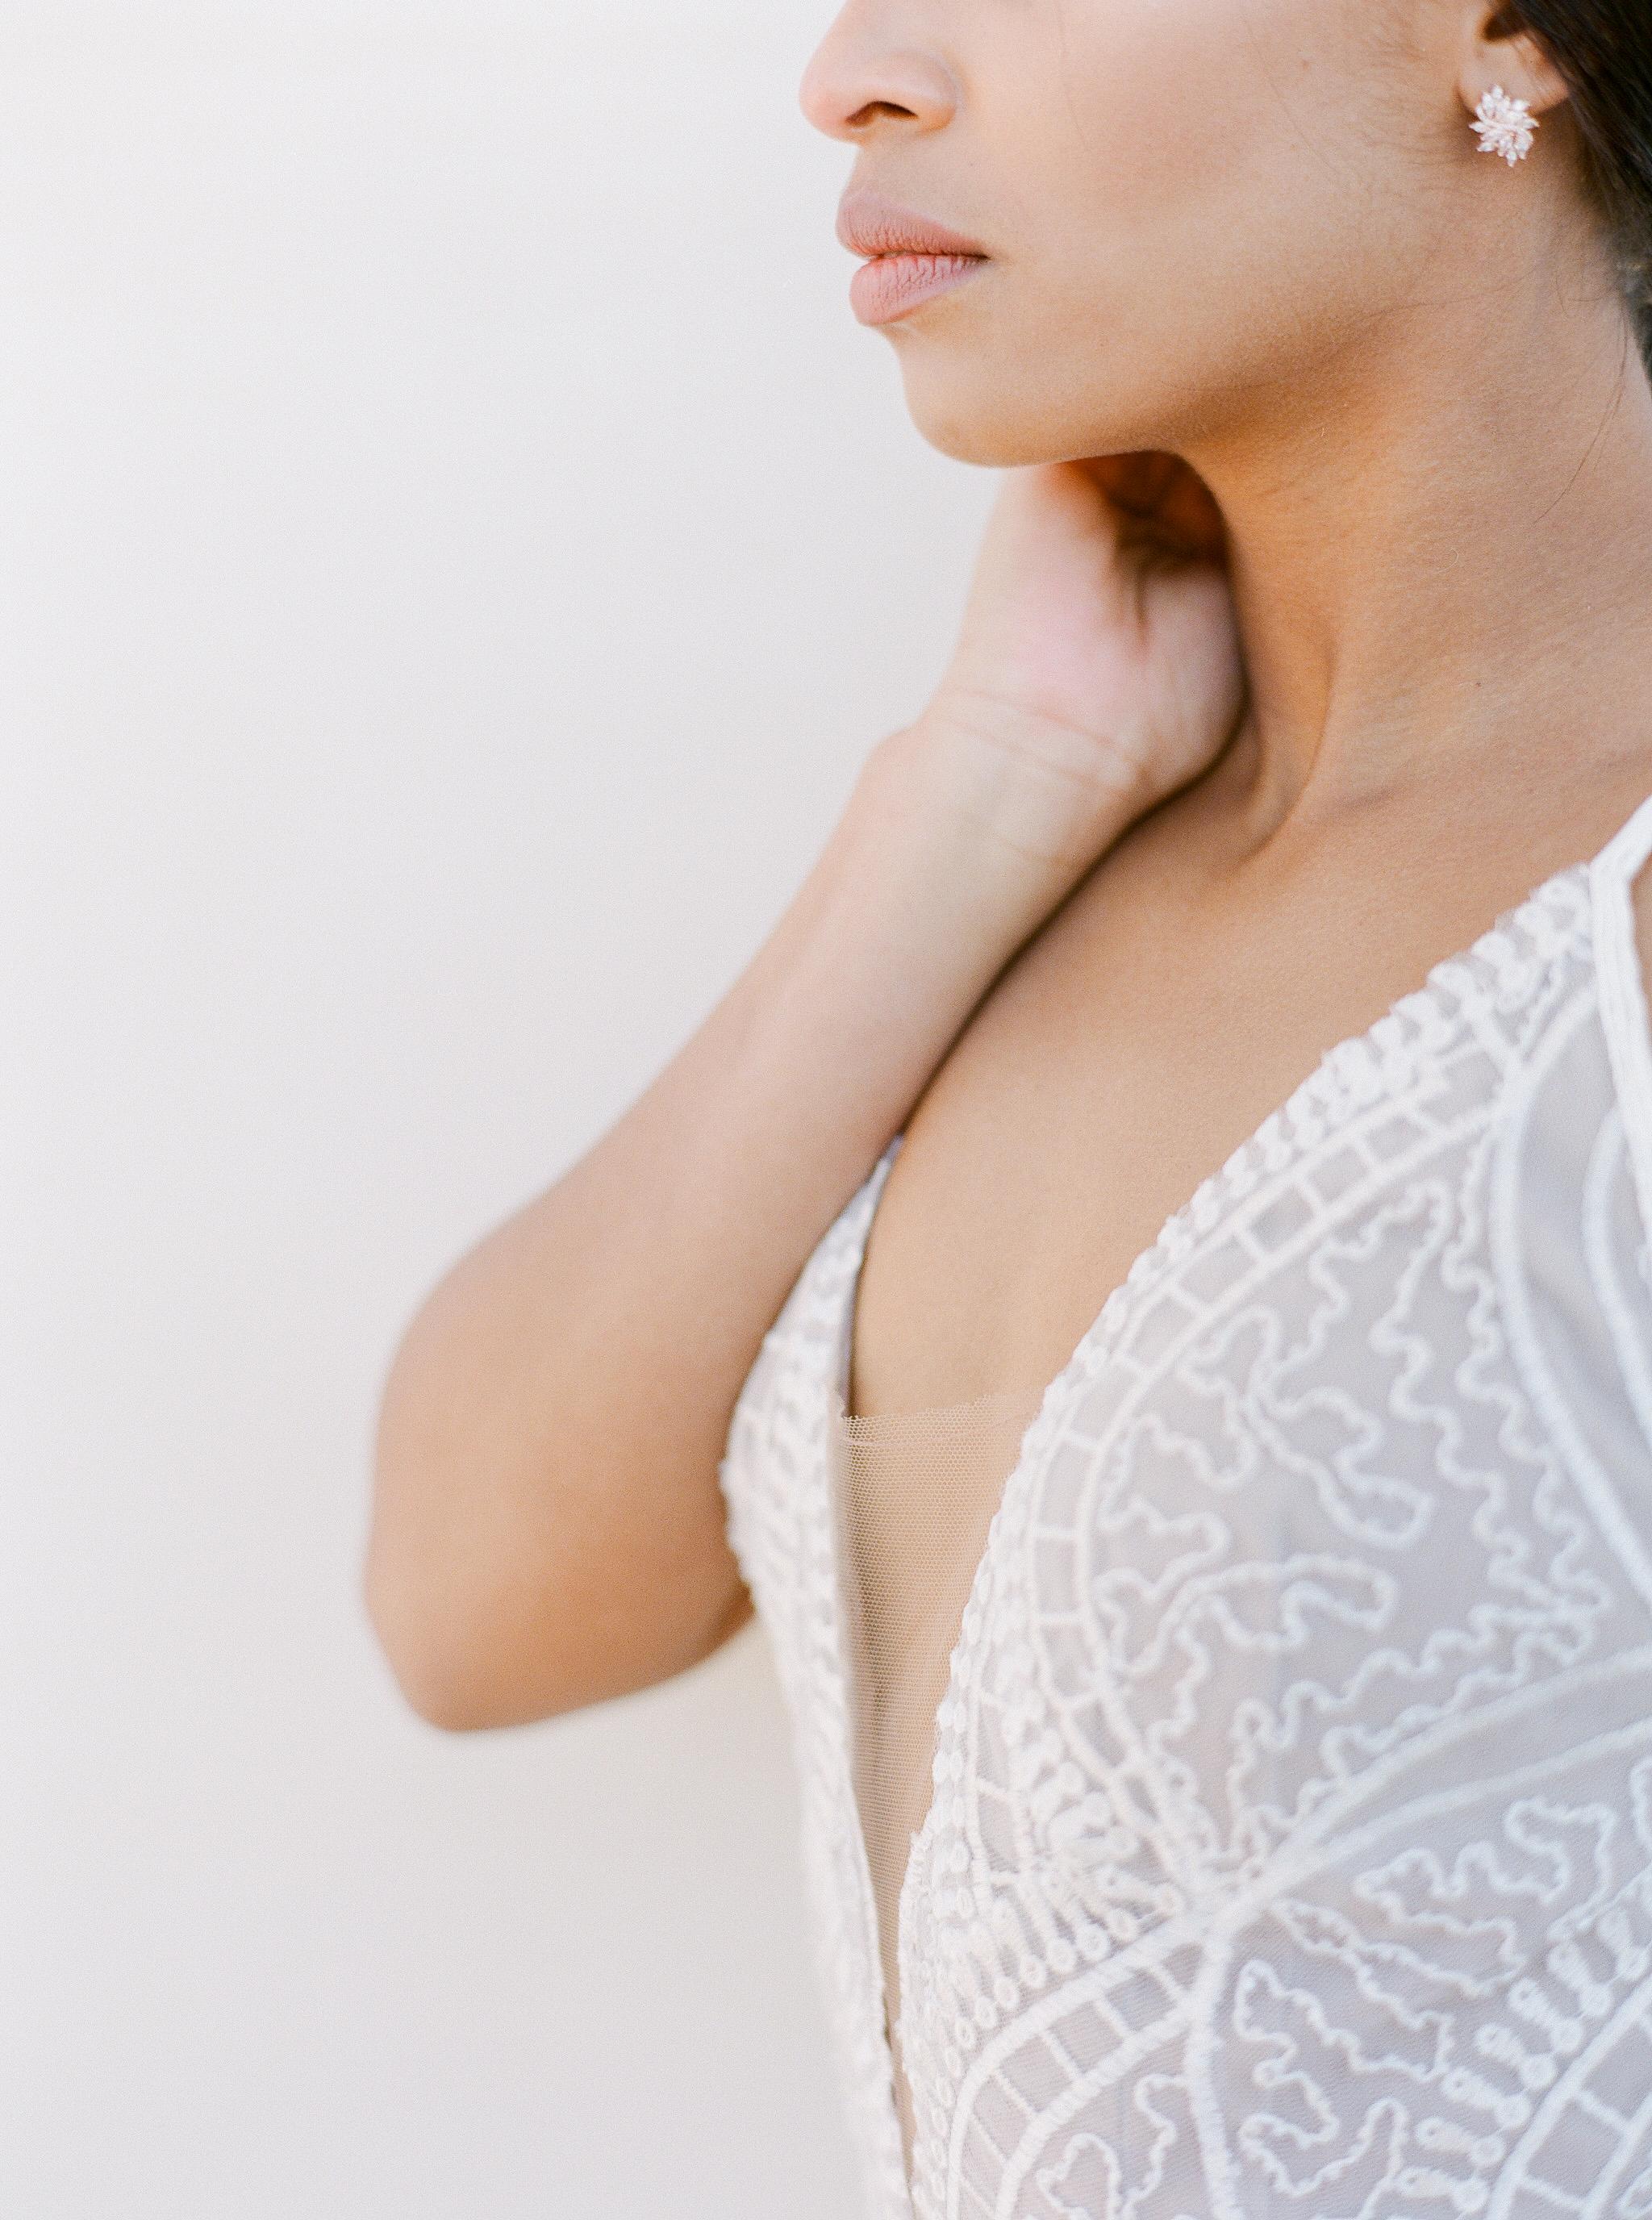 Savan Photography I Mon Amie Bridal Salon I Wtoo by Watters dress